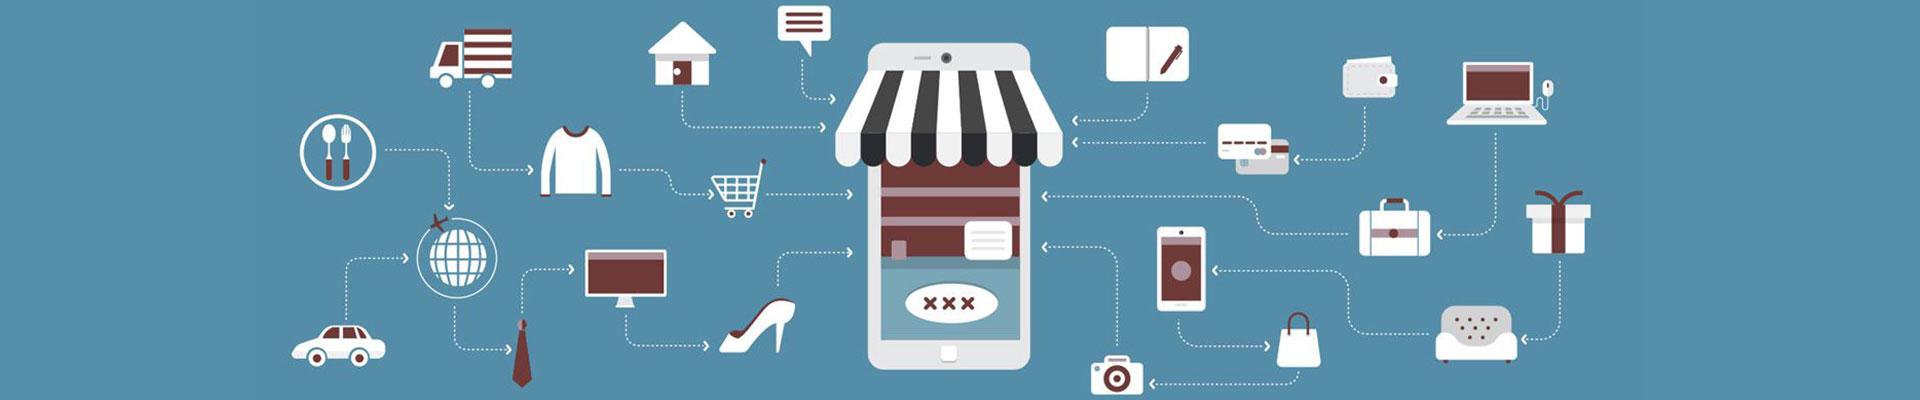 ecommerce-website-banner